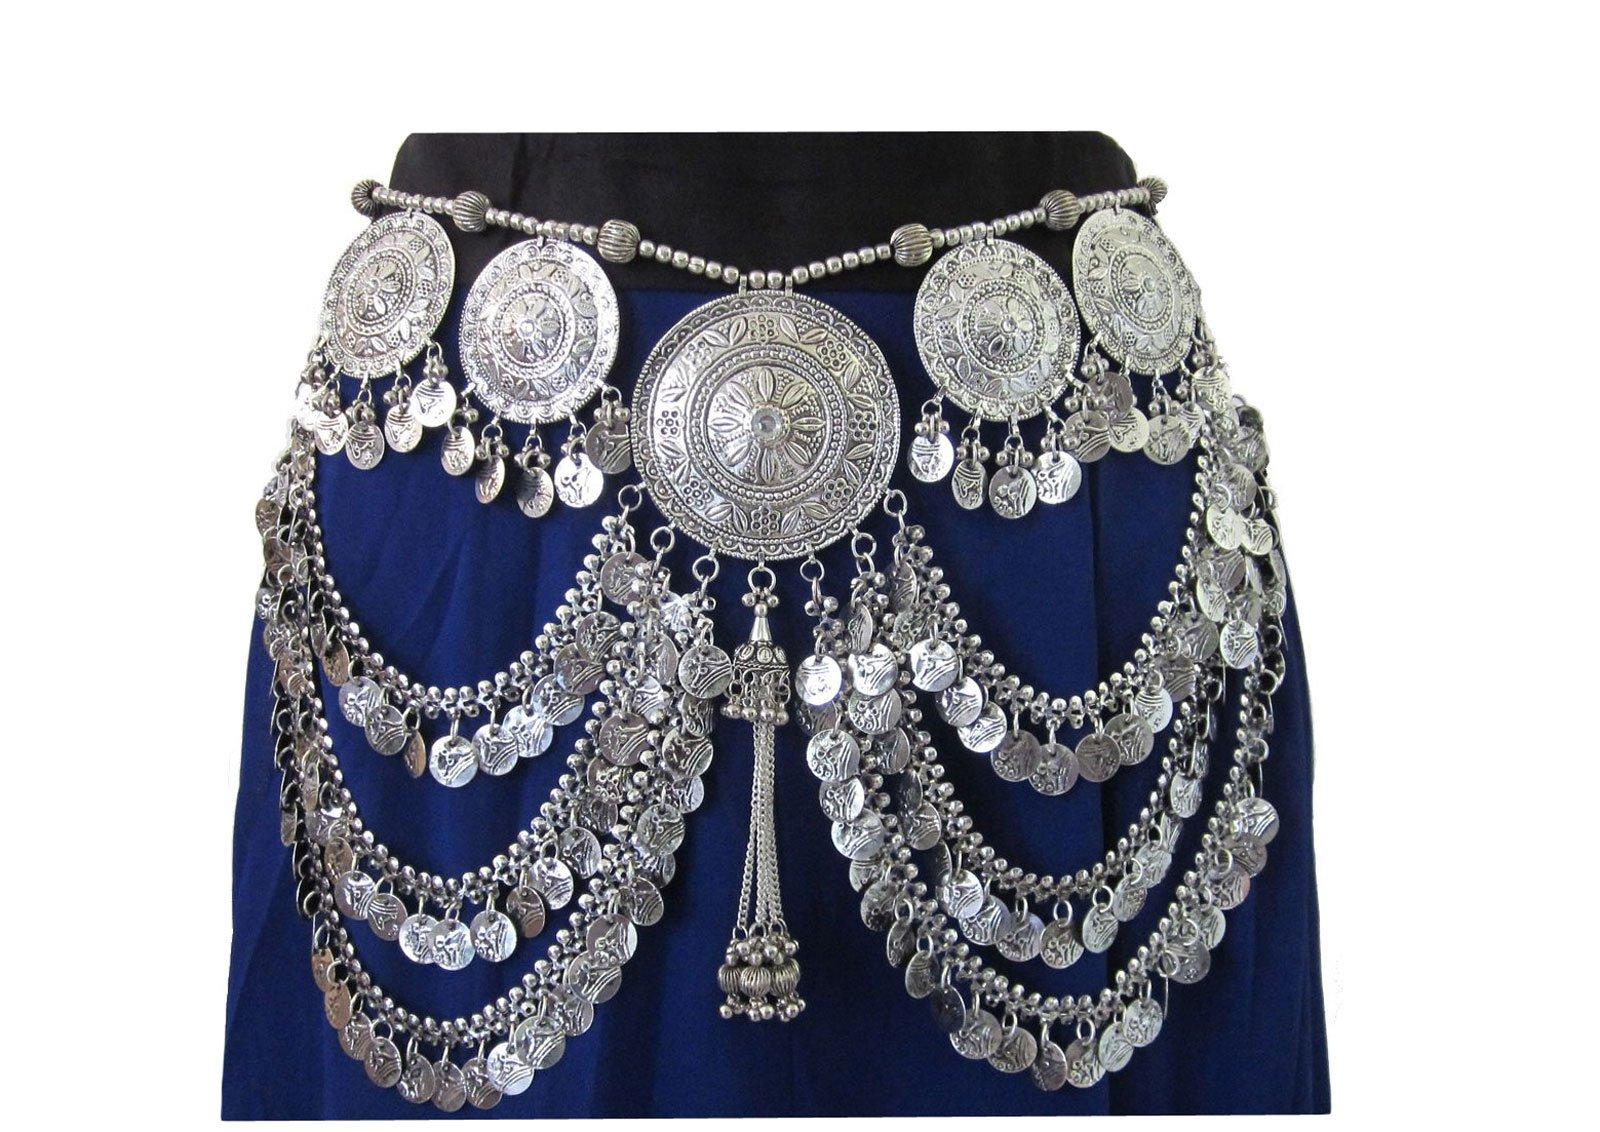 IndiaStop Tribal Belt Oxidized Vintage Festival Bohemian Womens Fashion Belly dance